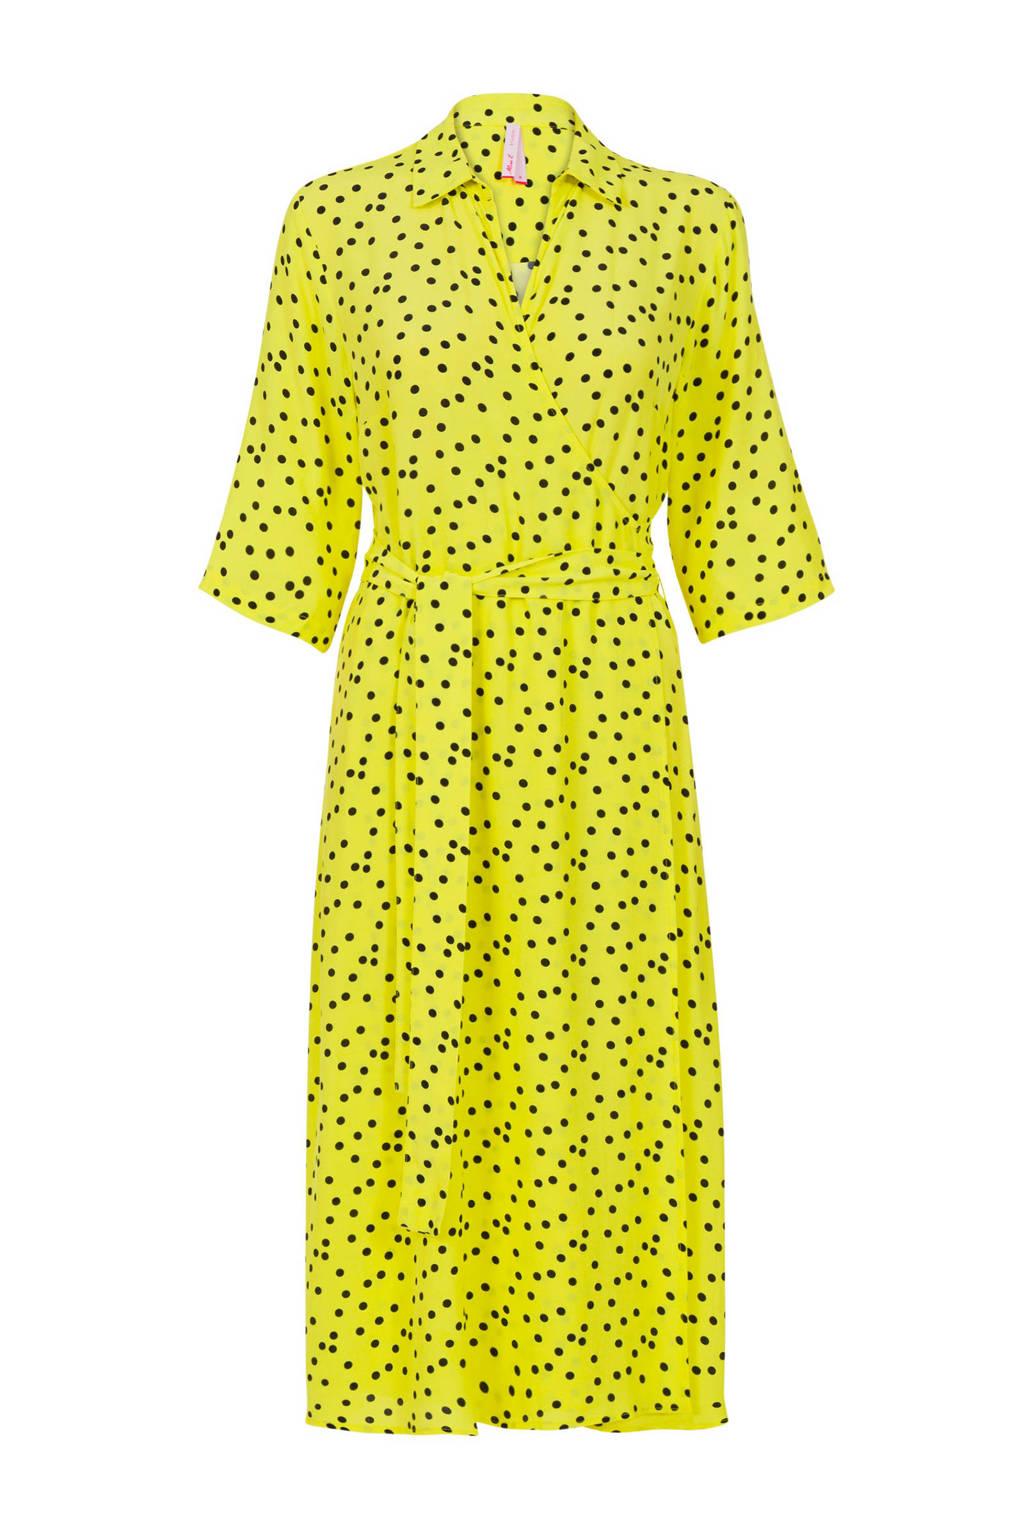 Miss Etam Regulier jurk met stippen geel, Geel